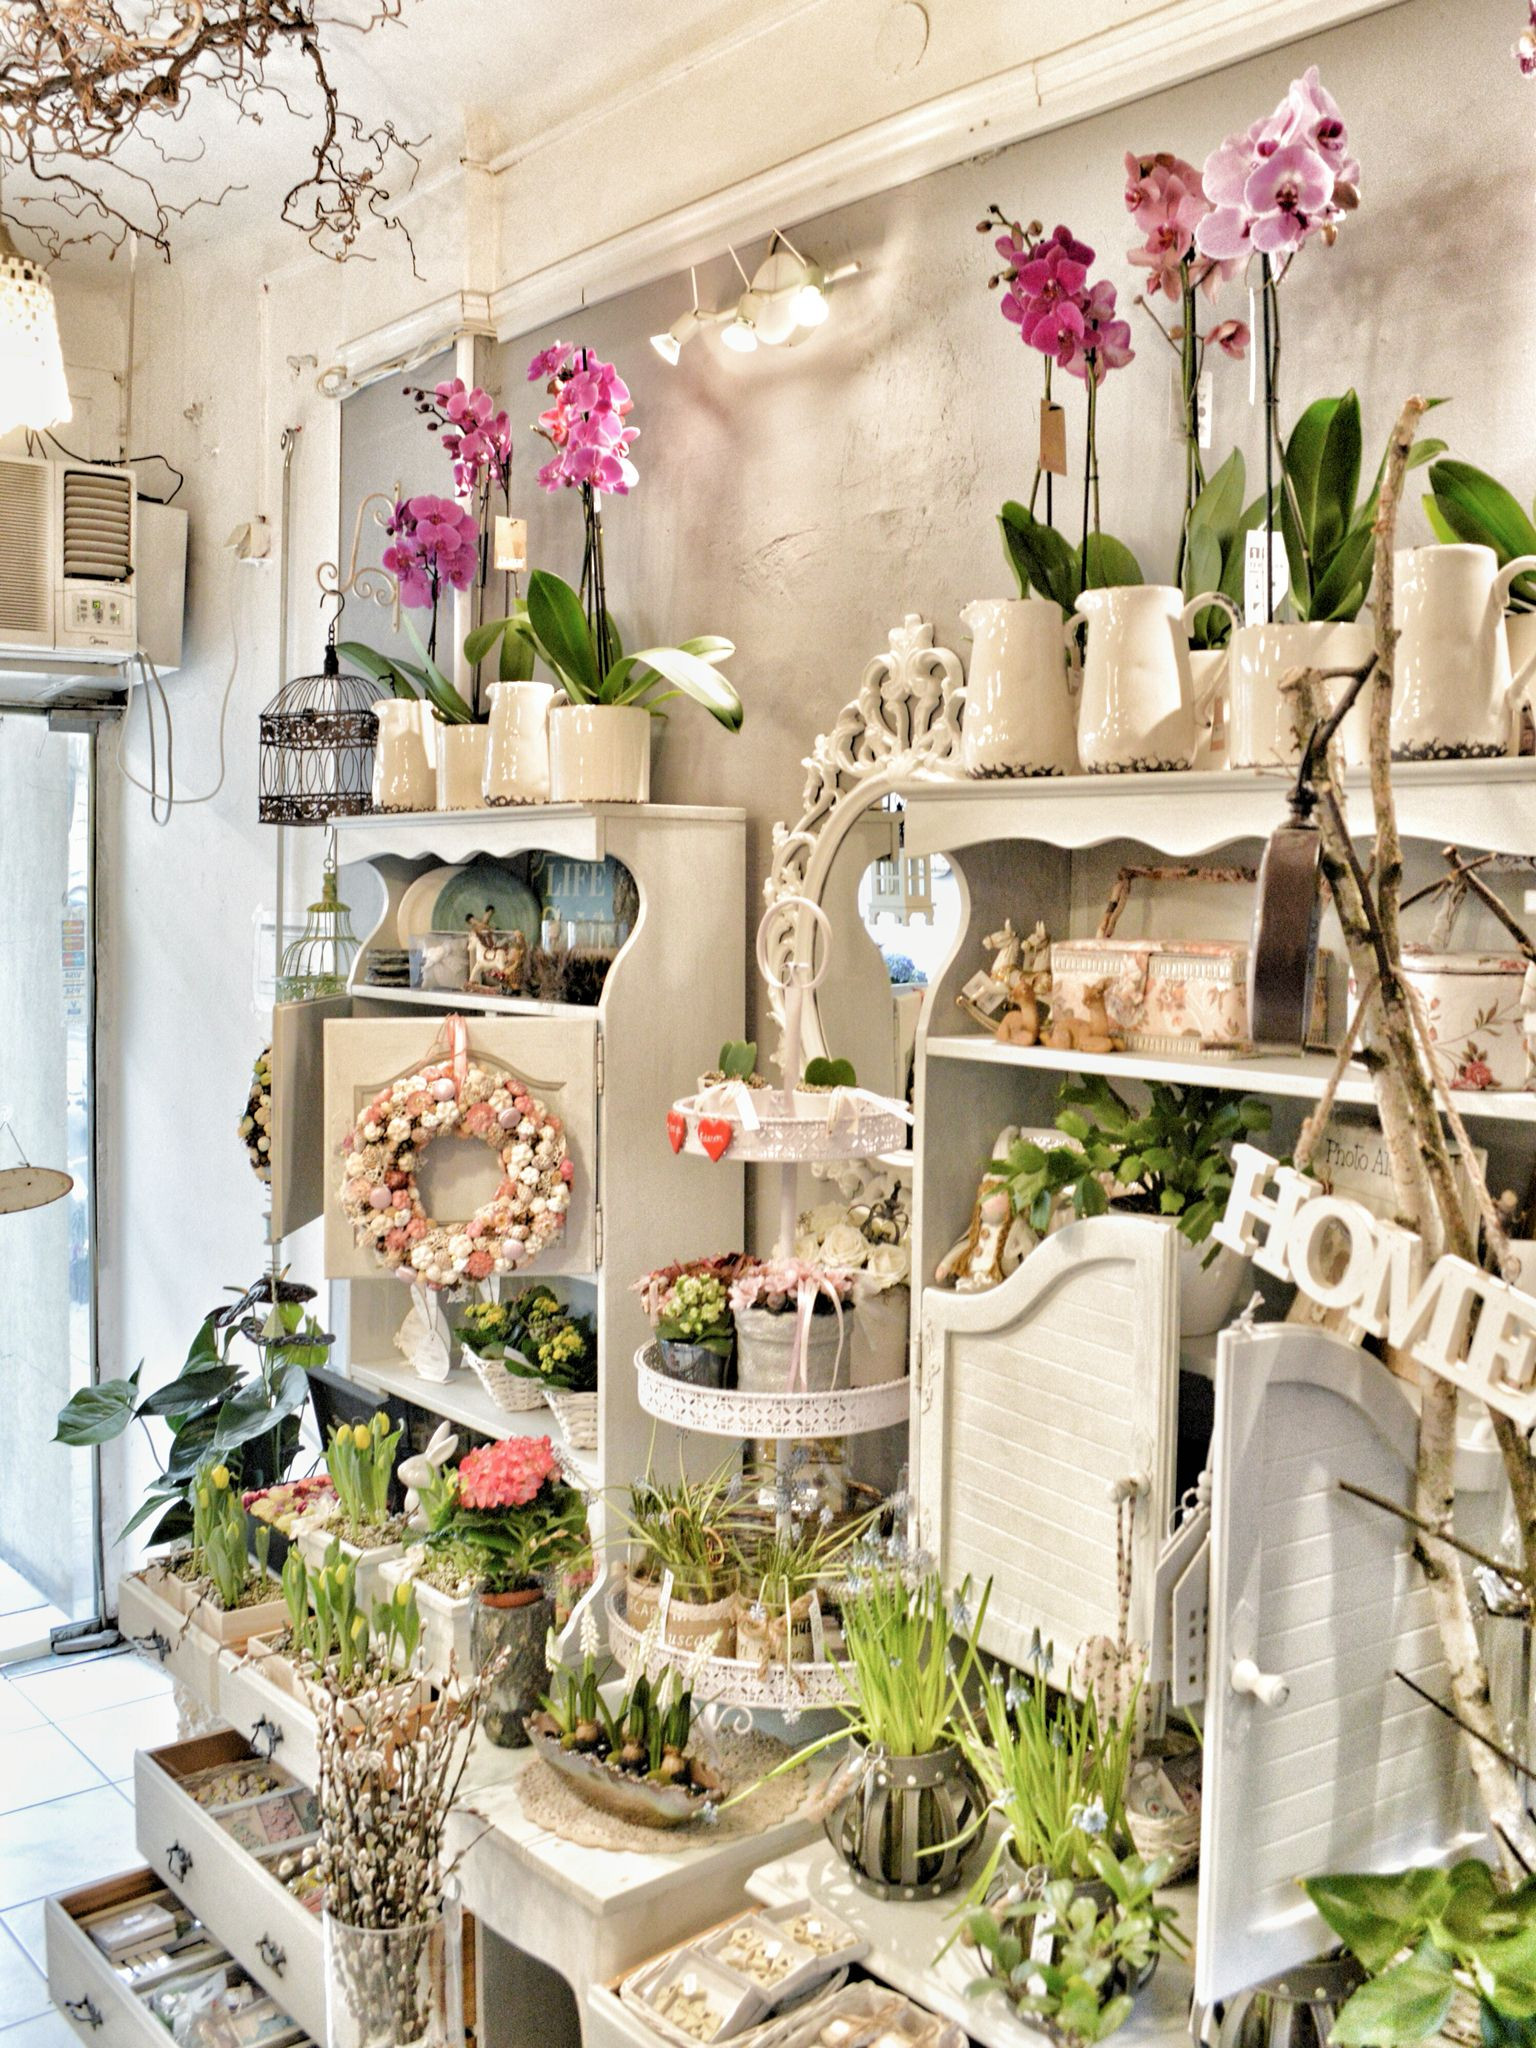 DIFIORI Virágszalon Flower shop interior in Budapest